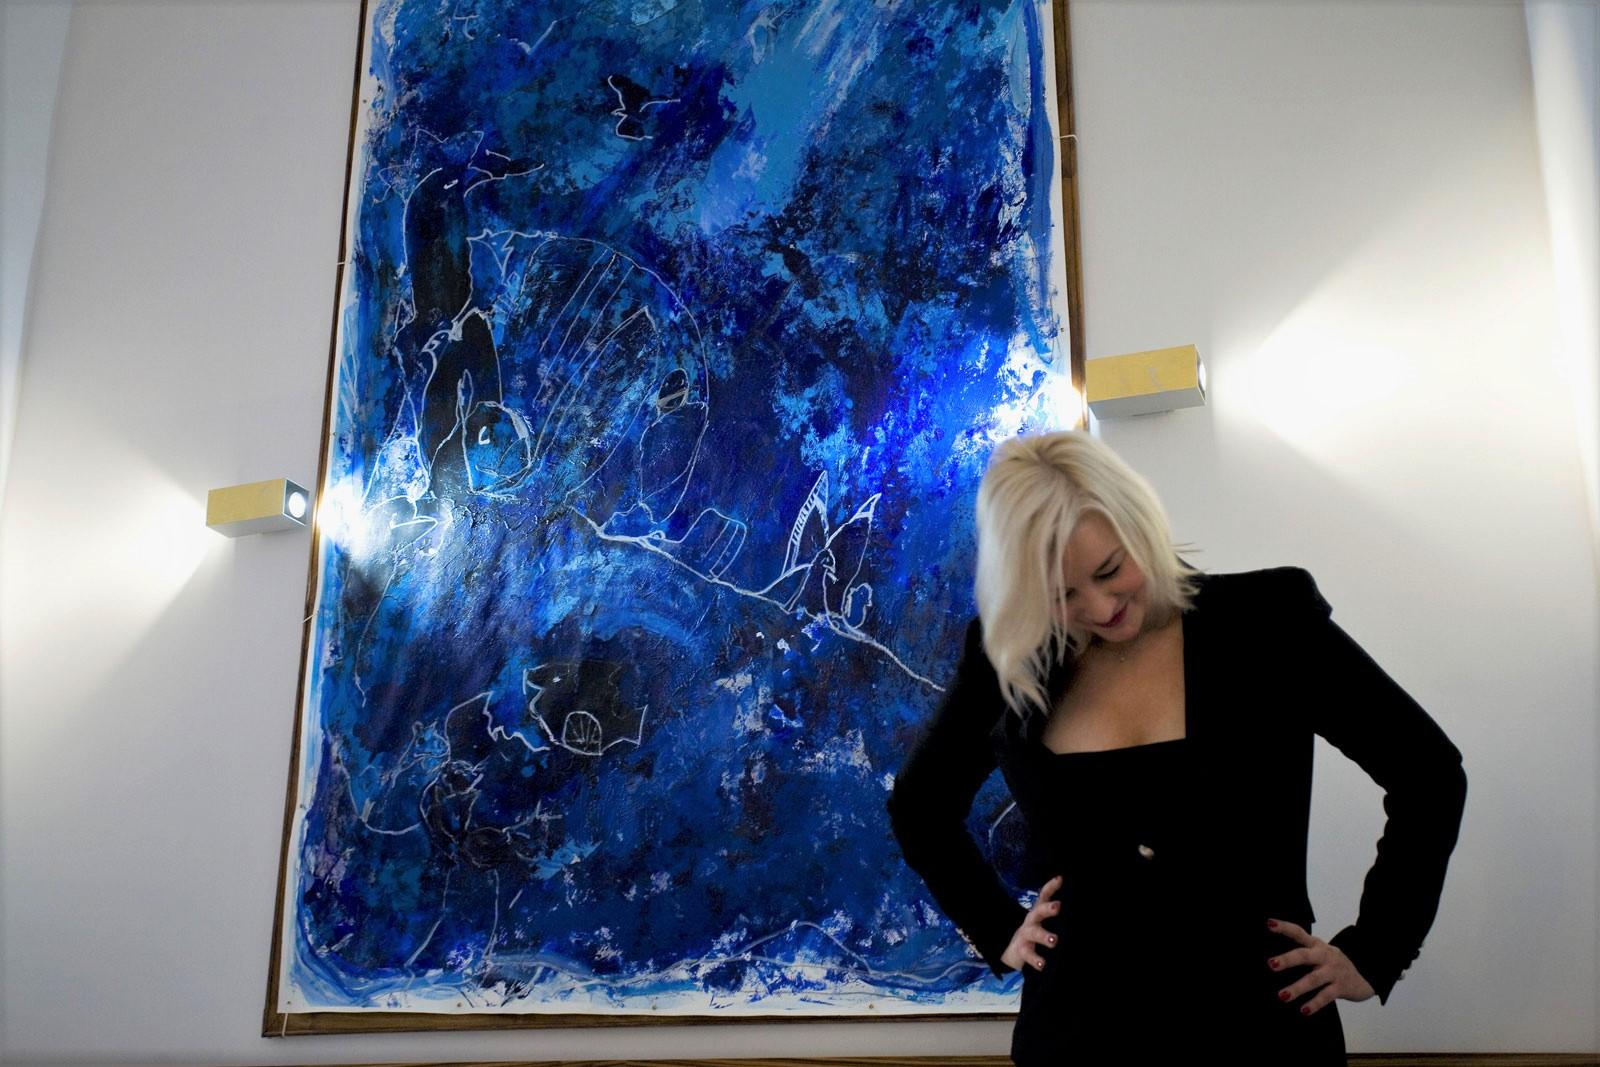 Big Blue, object art, animal skin 2.30 x 1.55 meter, object painting, cycle Trophaeen - Kim Okura at VCA Vienna City Apartments™